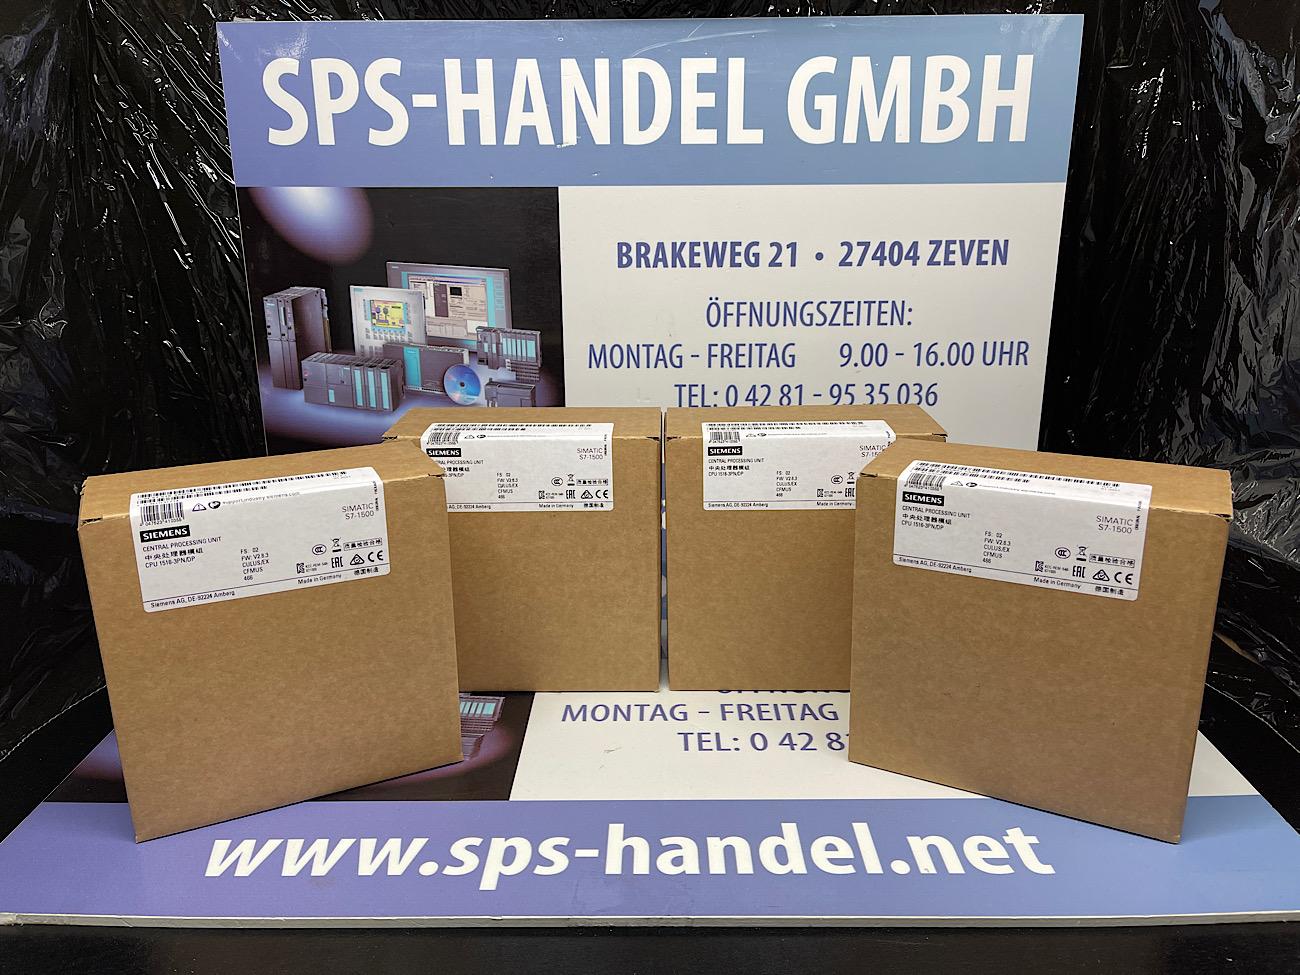 6ES7516-3AN02-0AB0 | CPU516-3PN/DP | NEU Siegel 26%